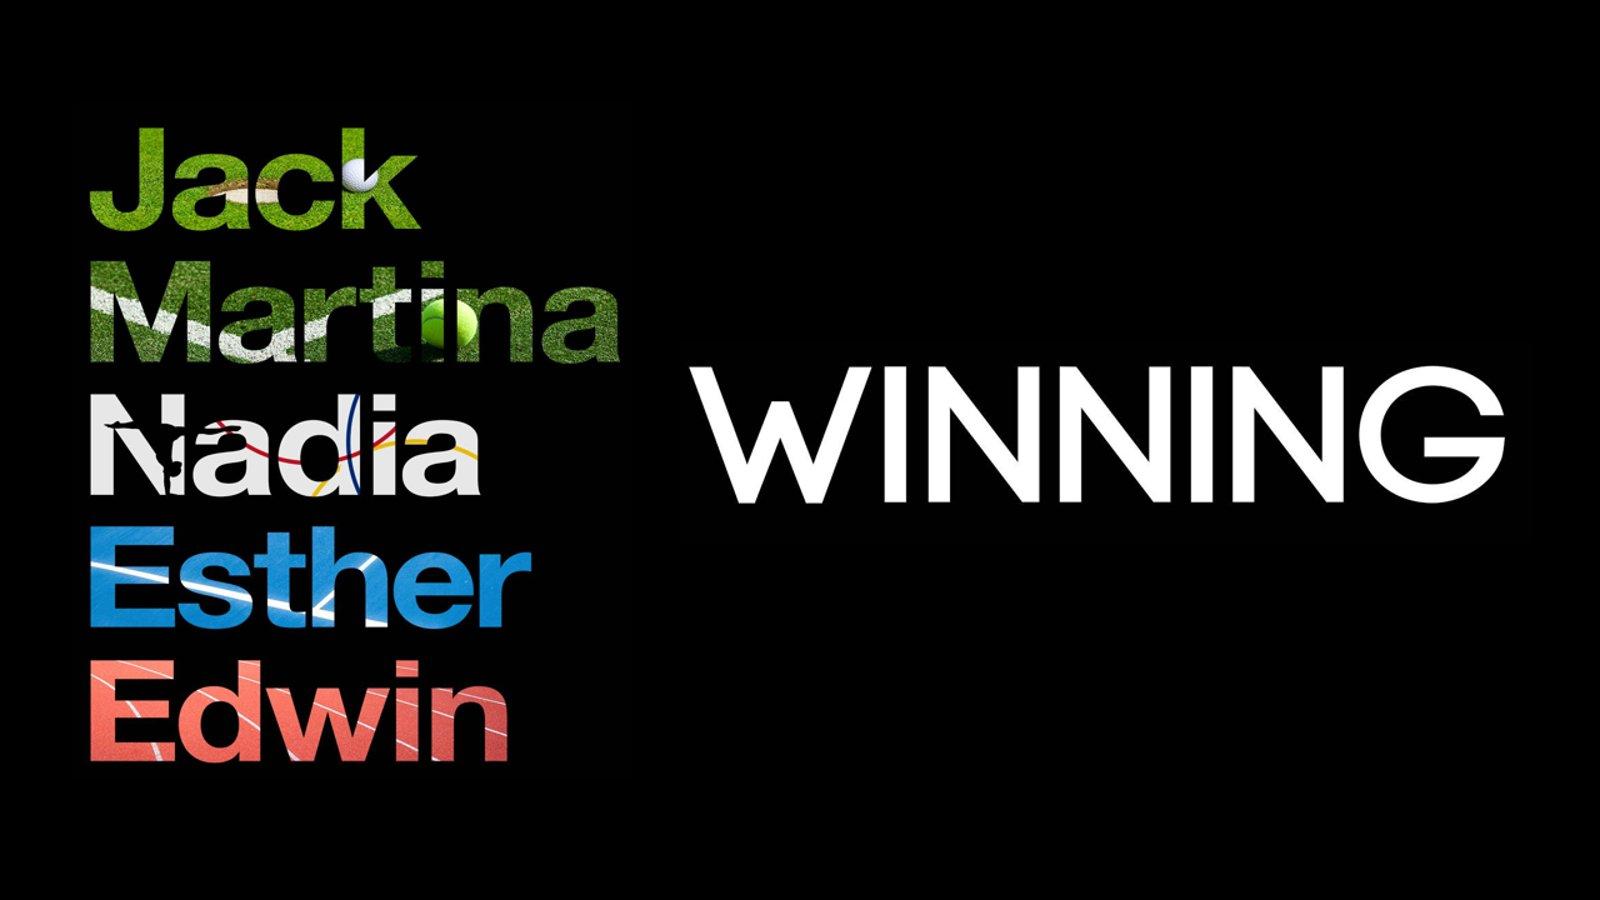 Winning - Five Legendary Athletes Tell Their Stories